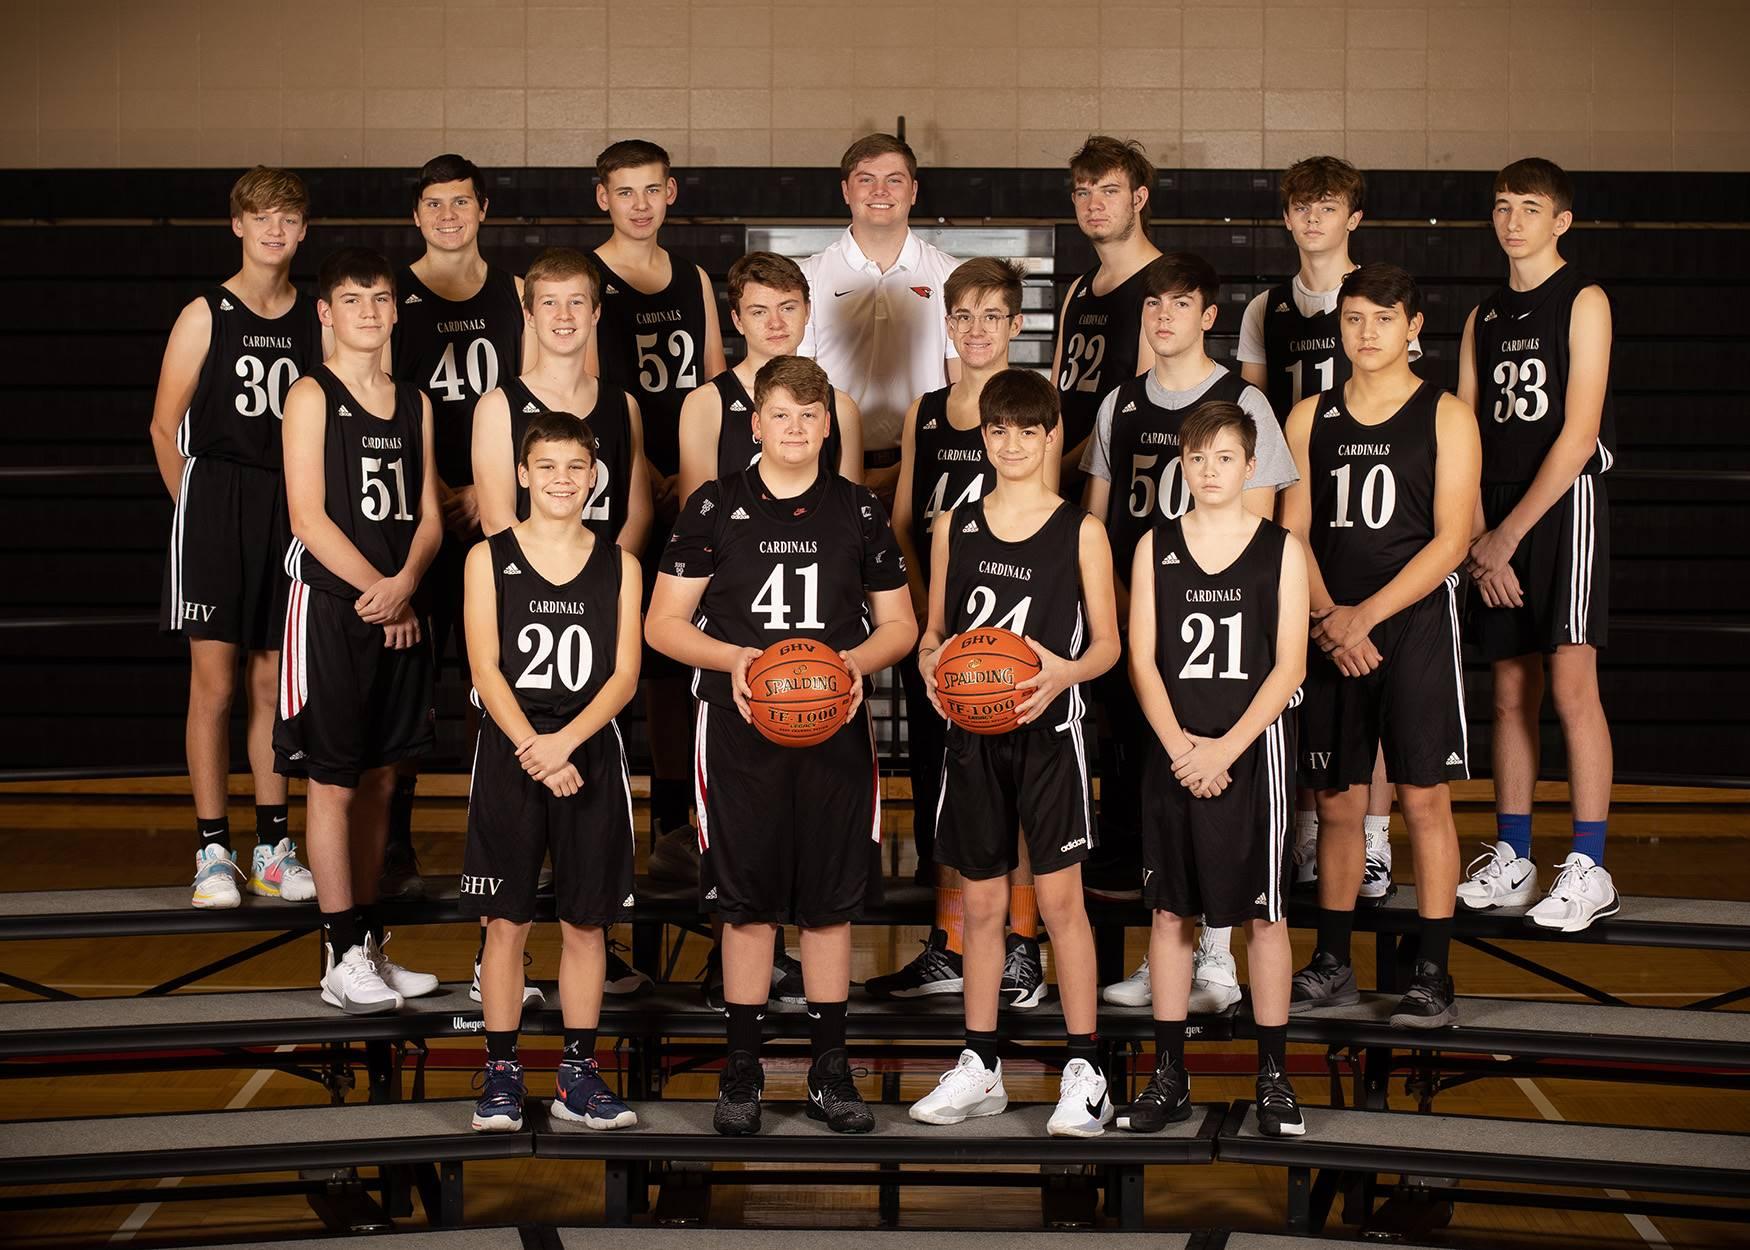 Boys Basketball team posing for a photo